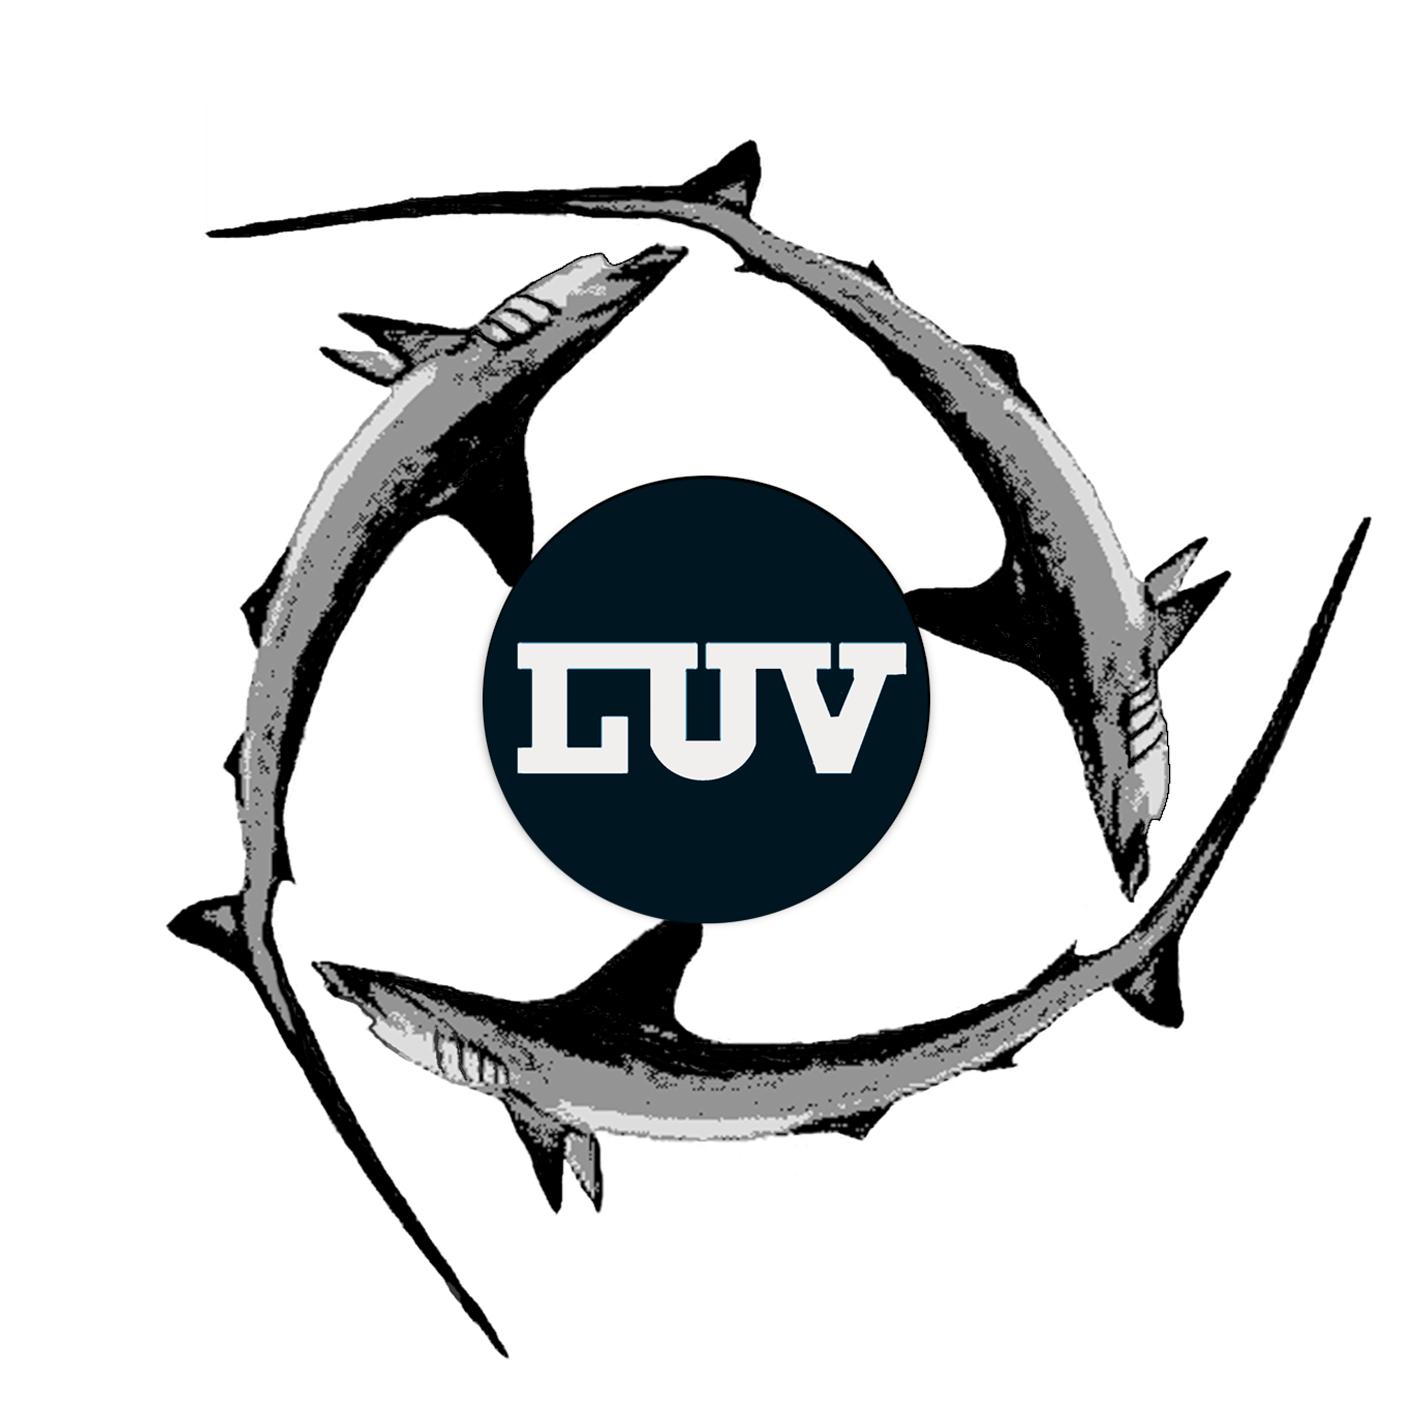 LUV CLUB 1994 BIS 1999